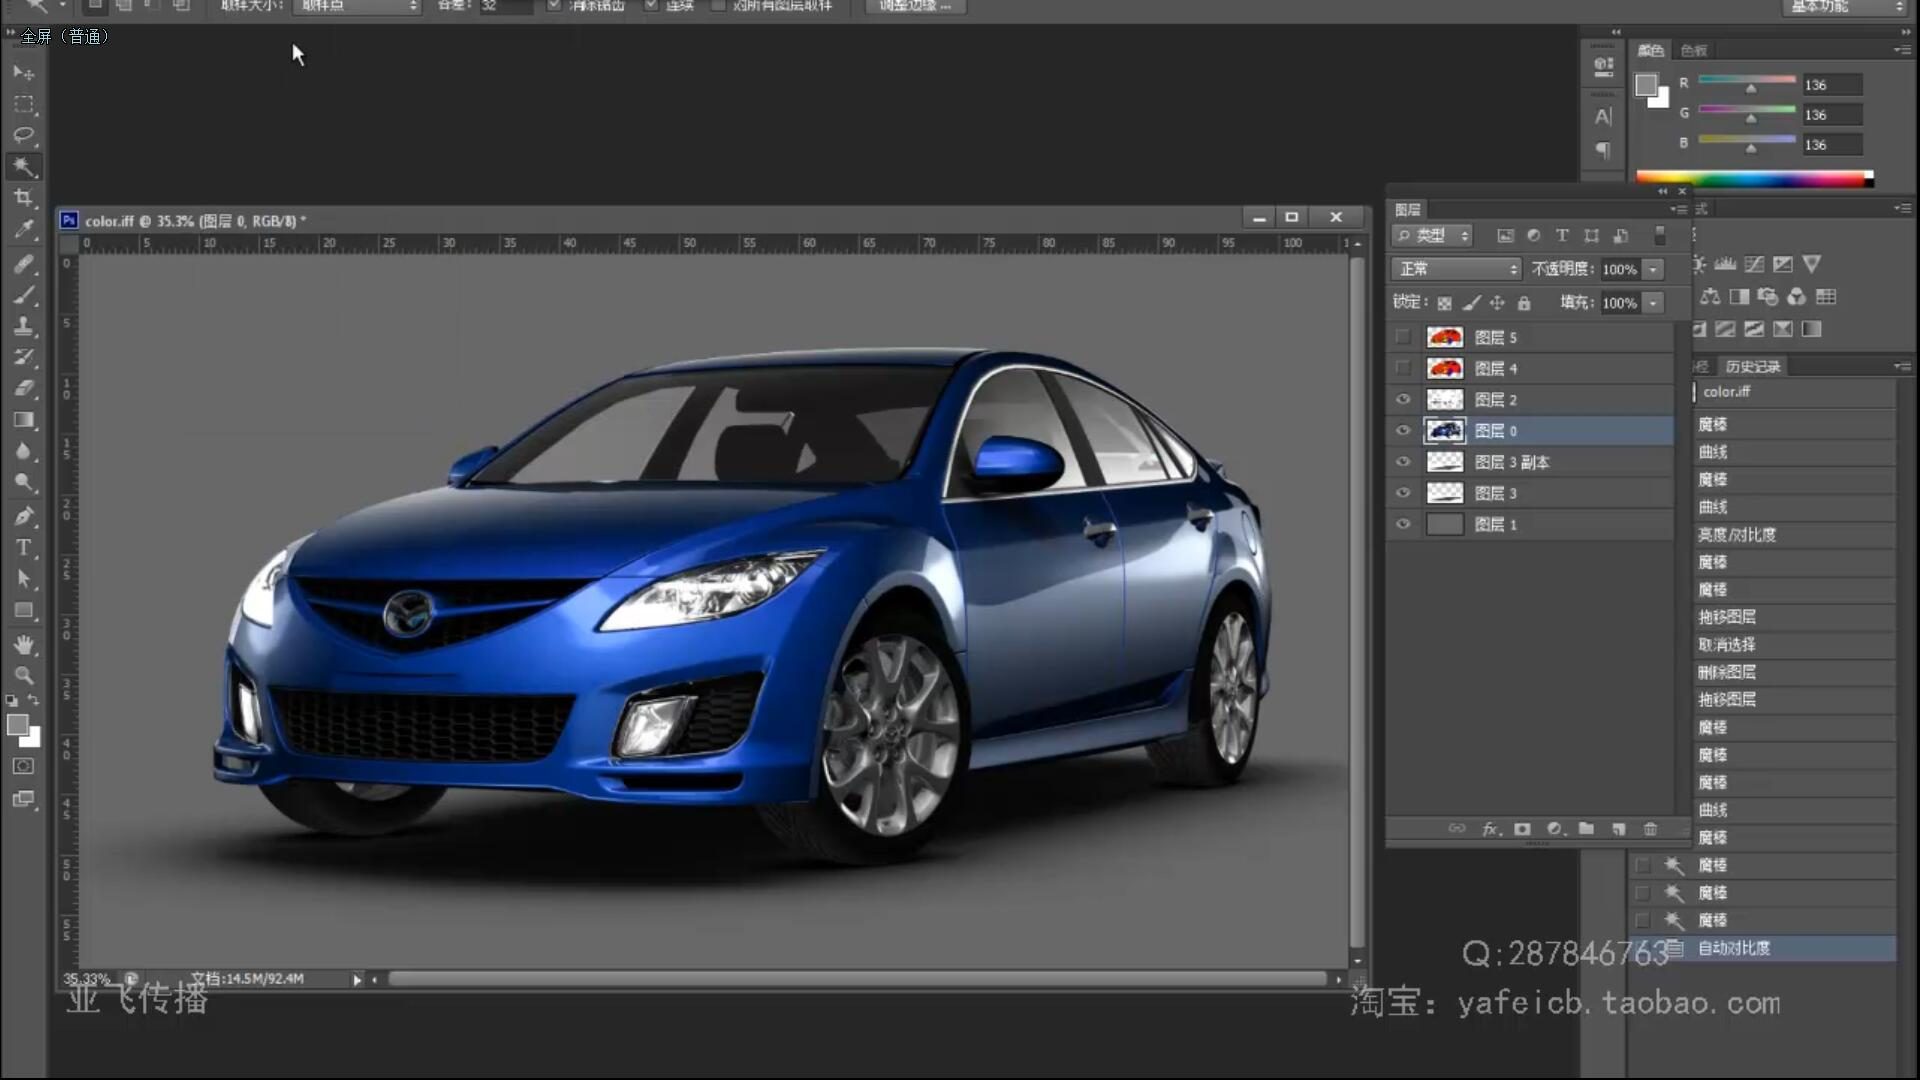 HDR light studio5.5 原创中文教程 宝马车案例 马自达车案例